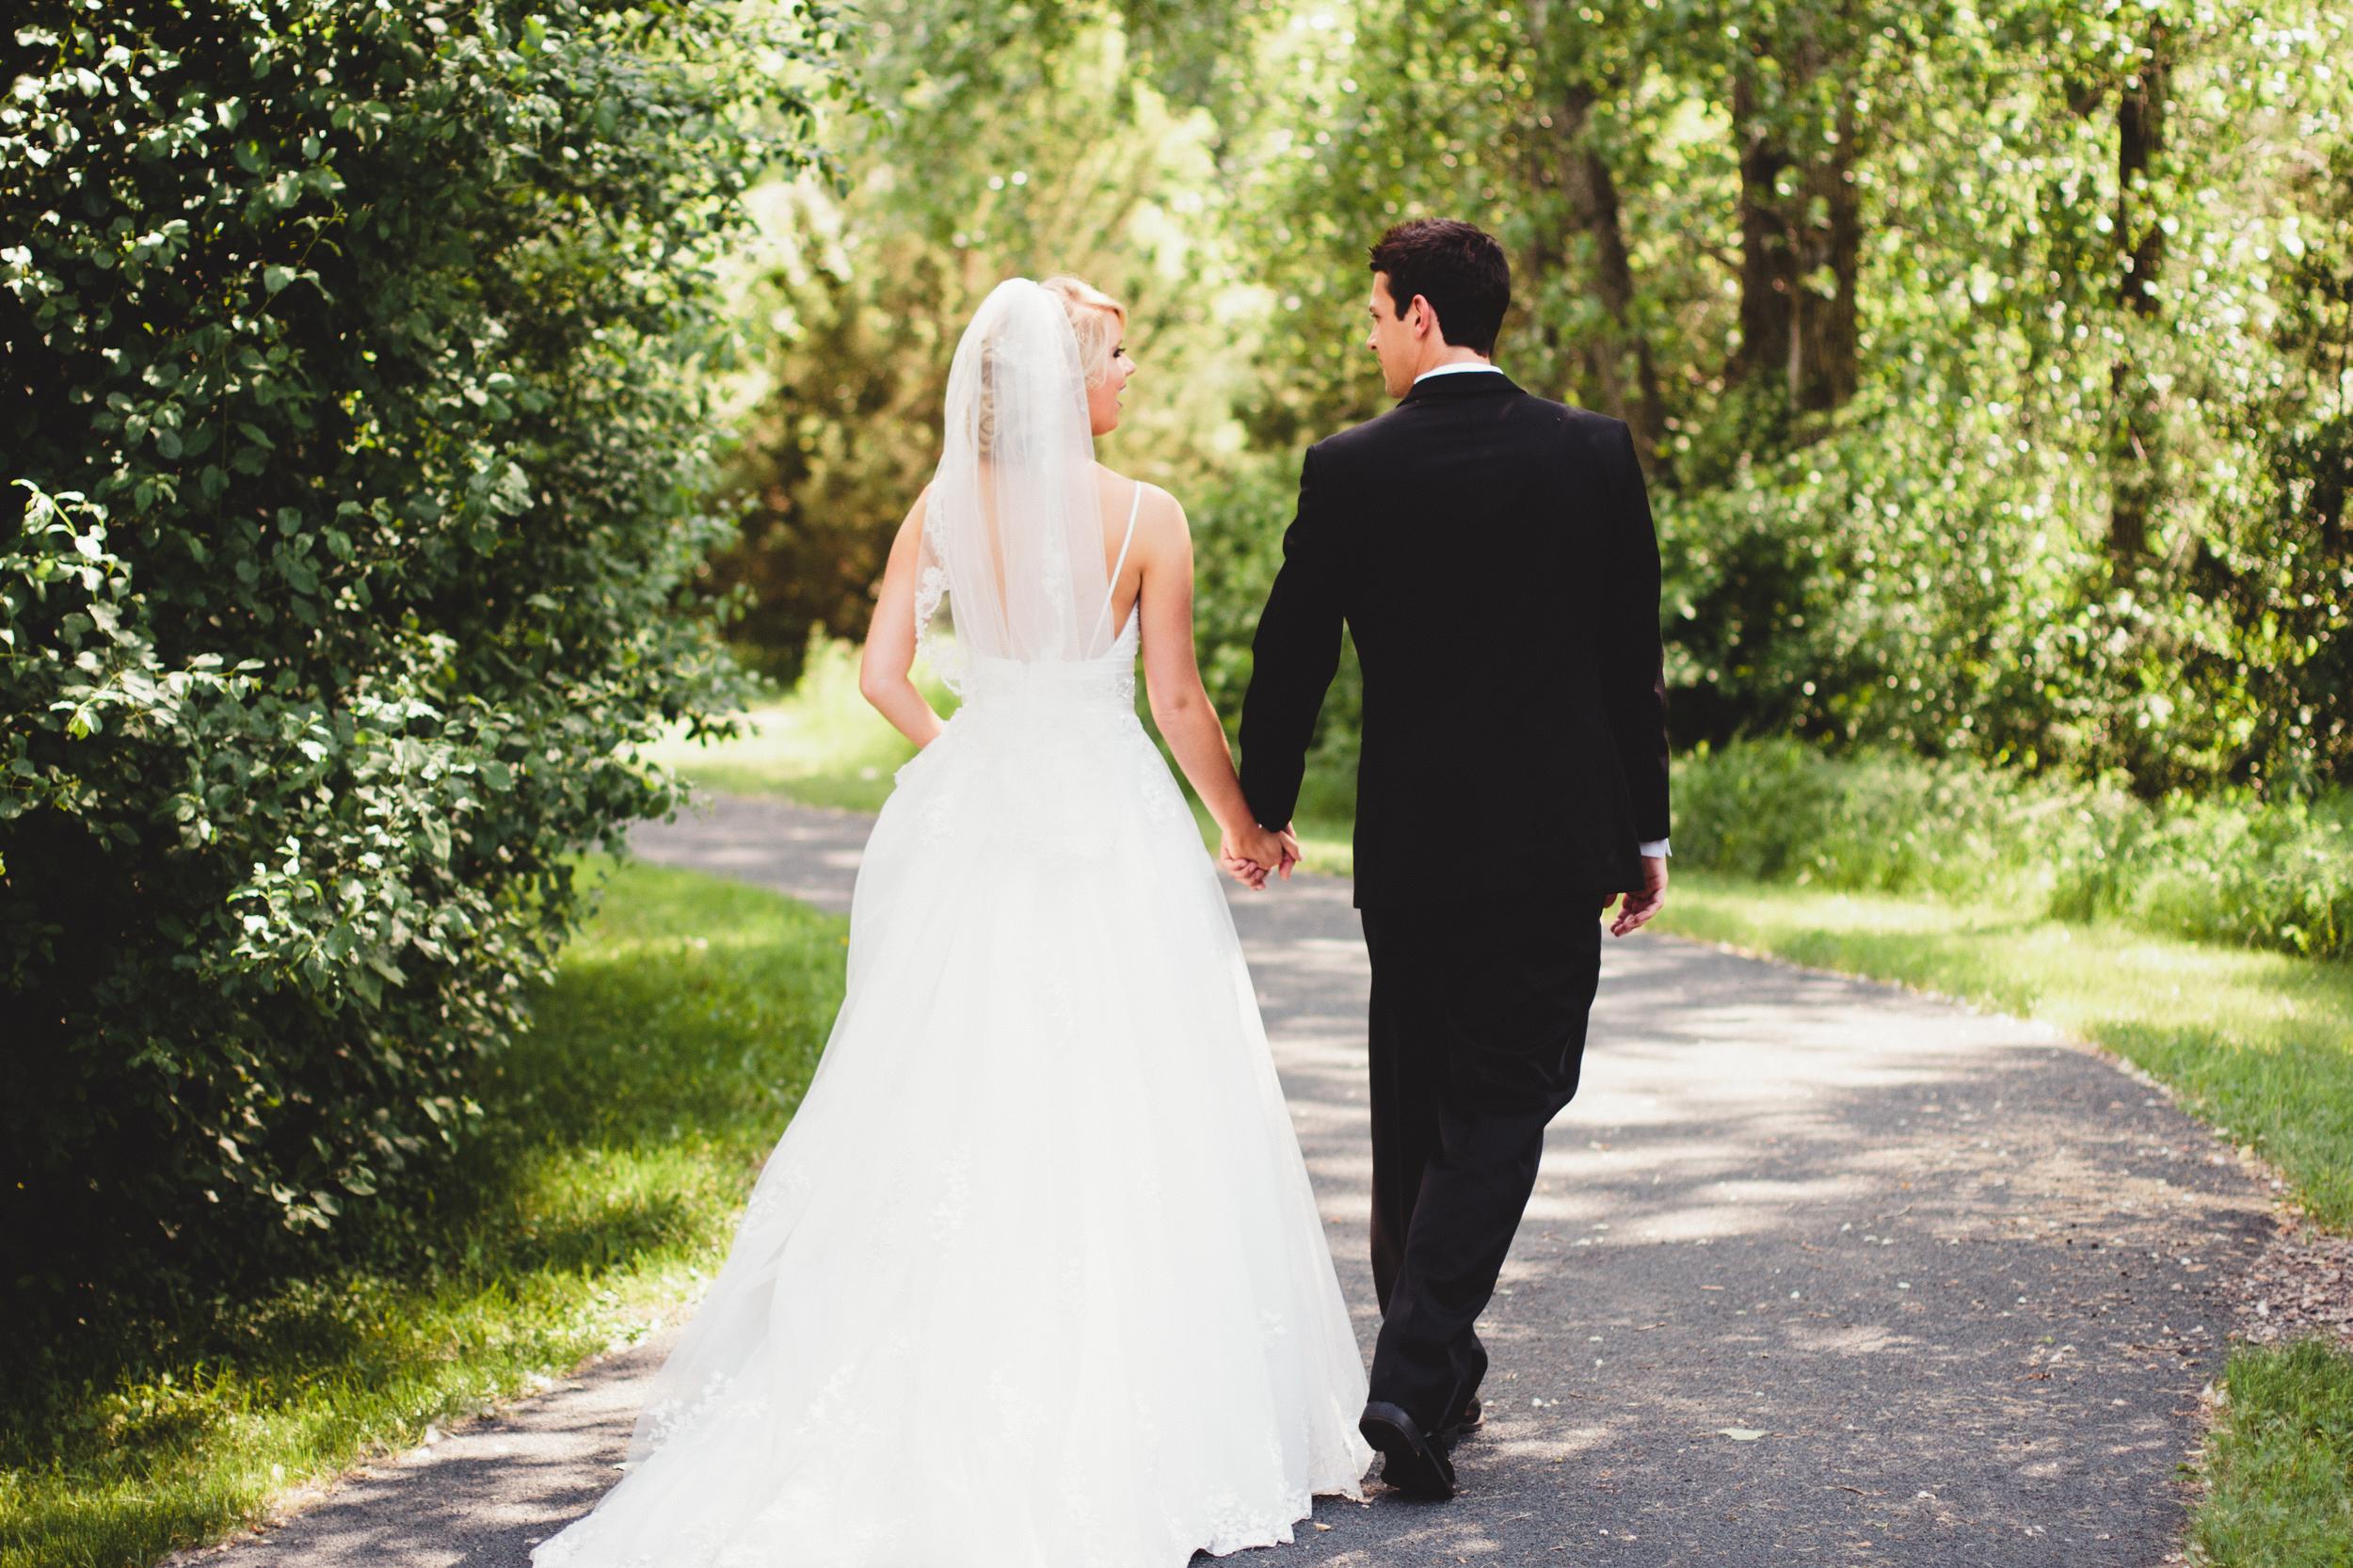 minneapolis wedding photographer-8 copy.jpg